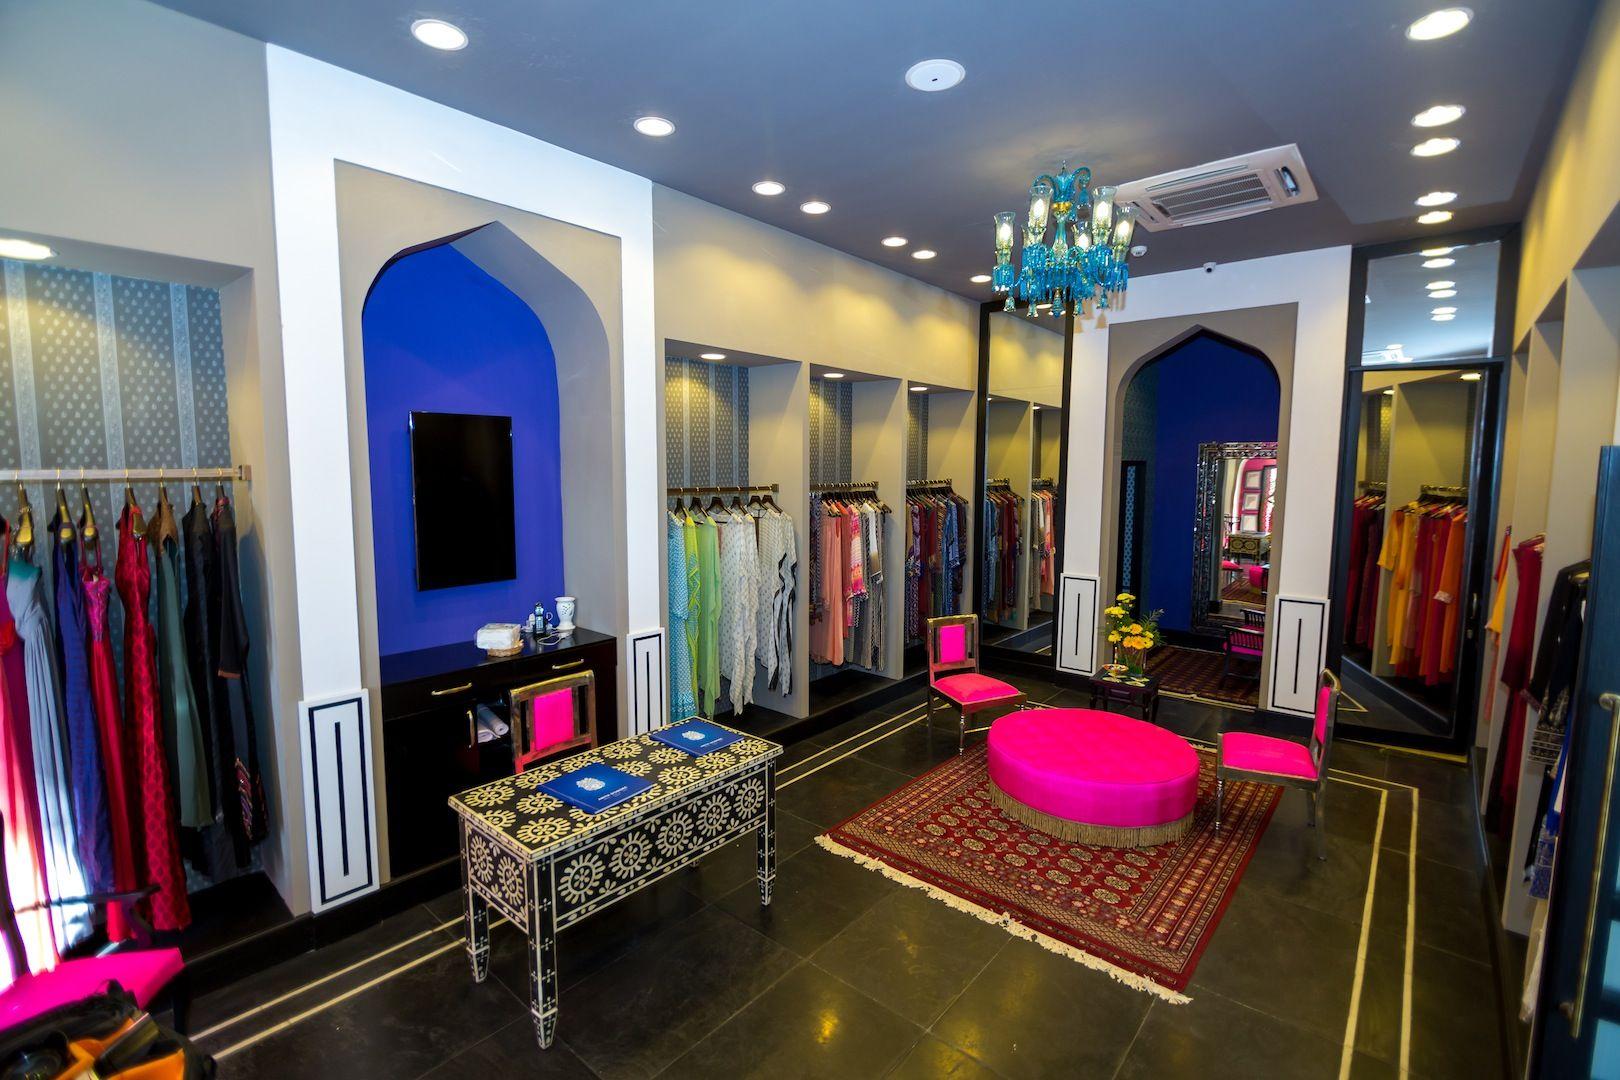 India Bridal Stores Google Search Showroom Decor Shop Interiors Store Interiors